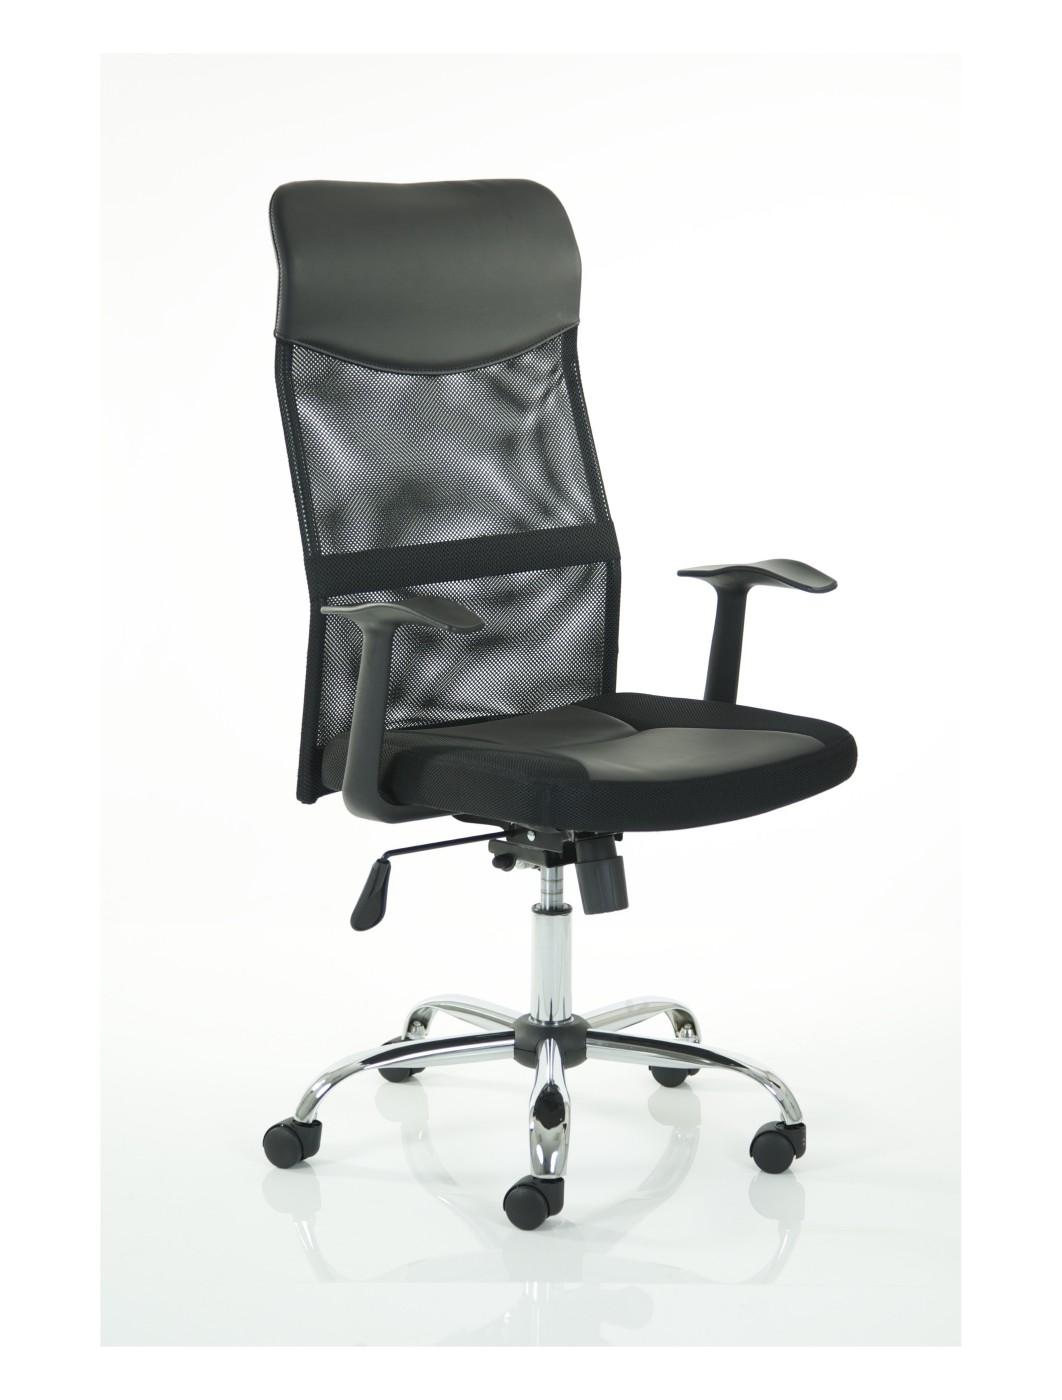 executive mesh office chair ikea ektorp jennylund cover dynamic vegalite ex000166